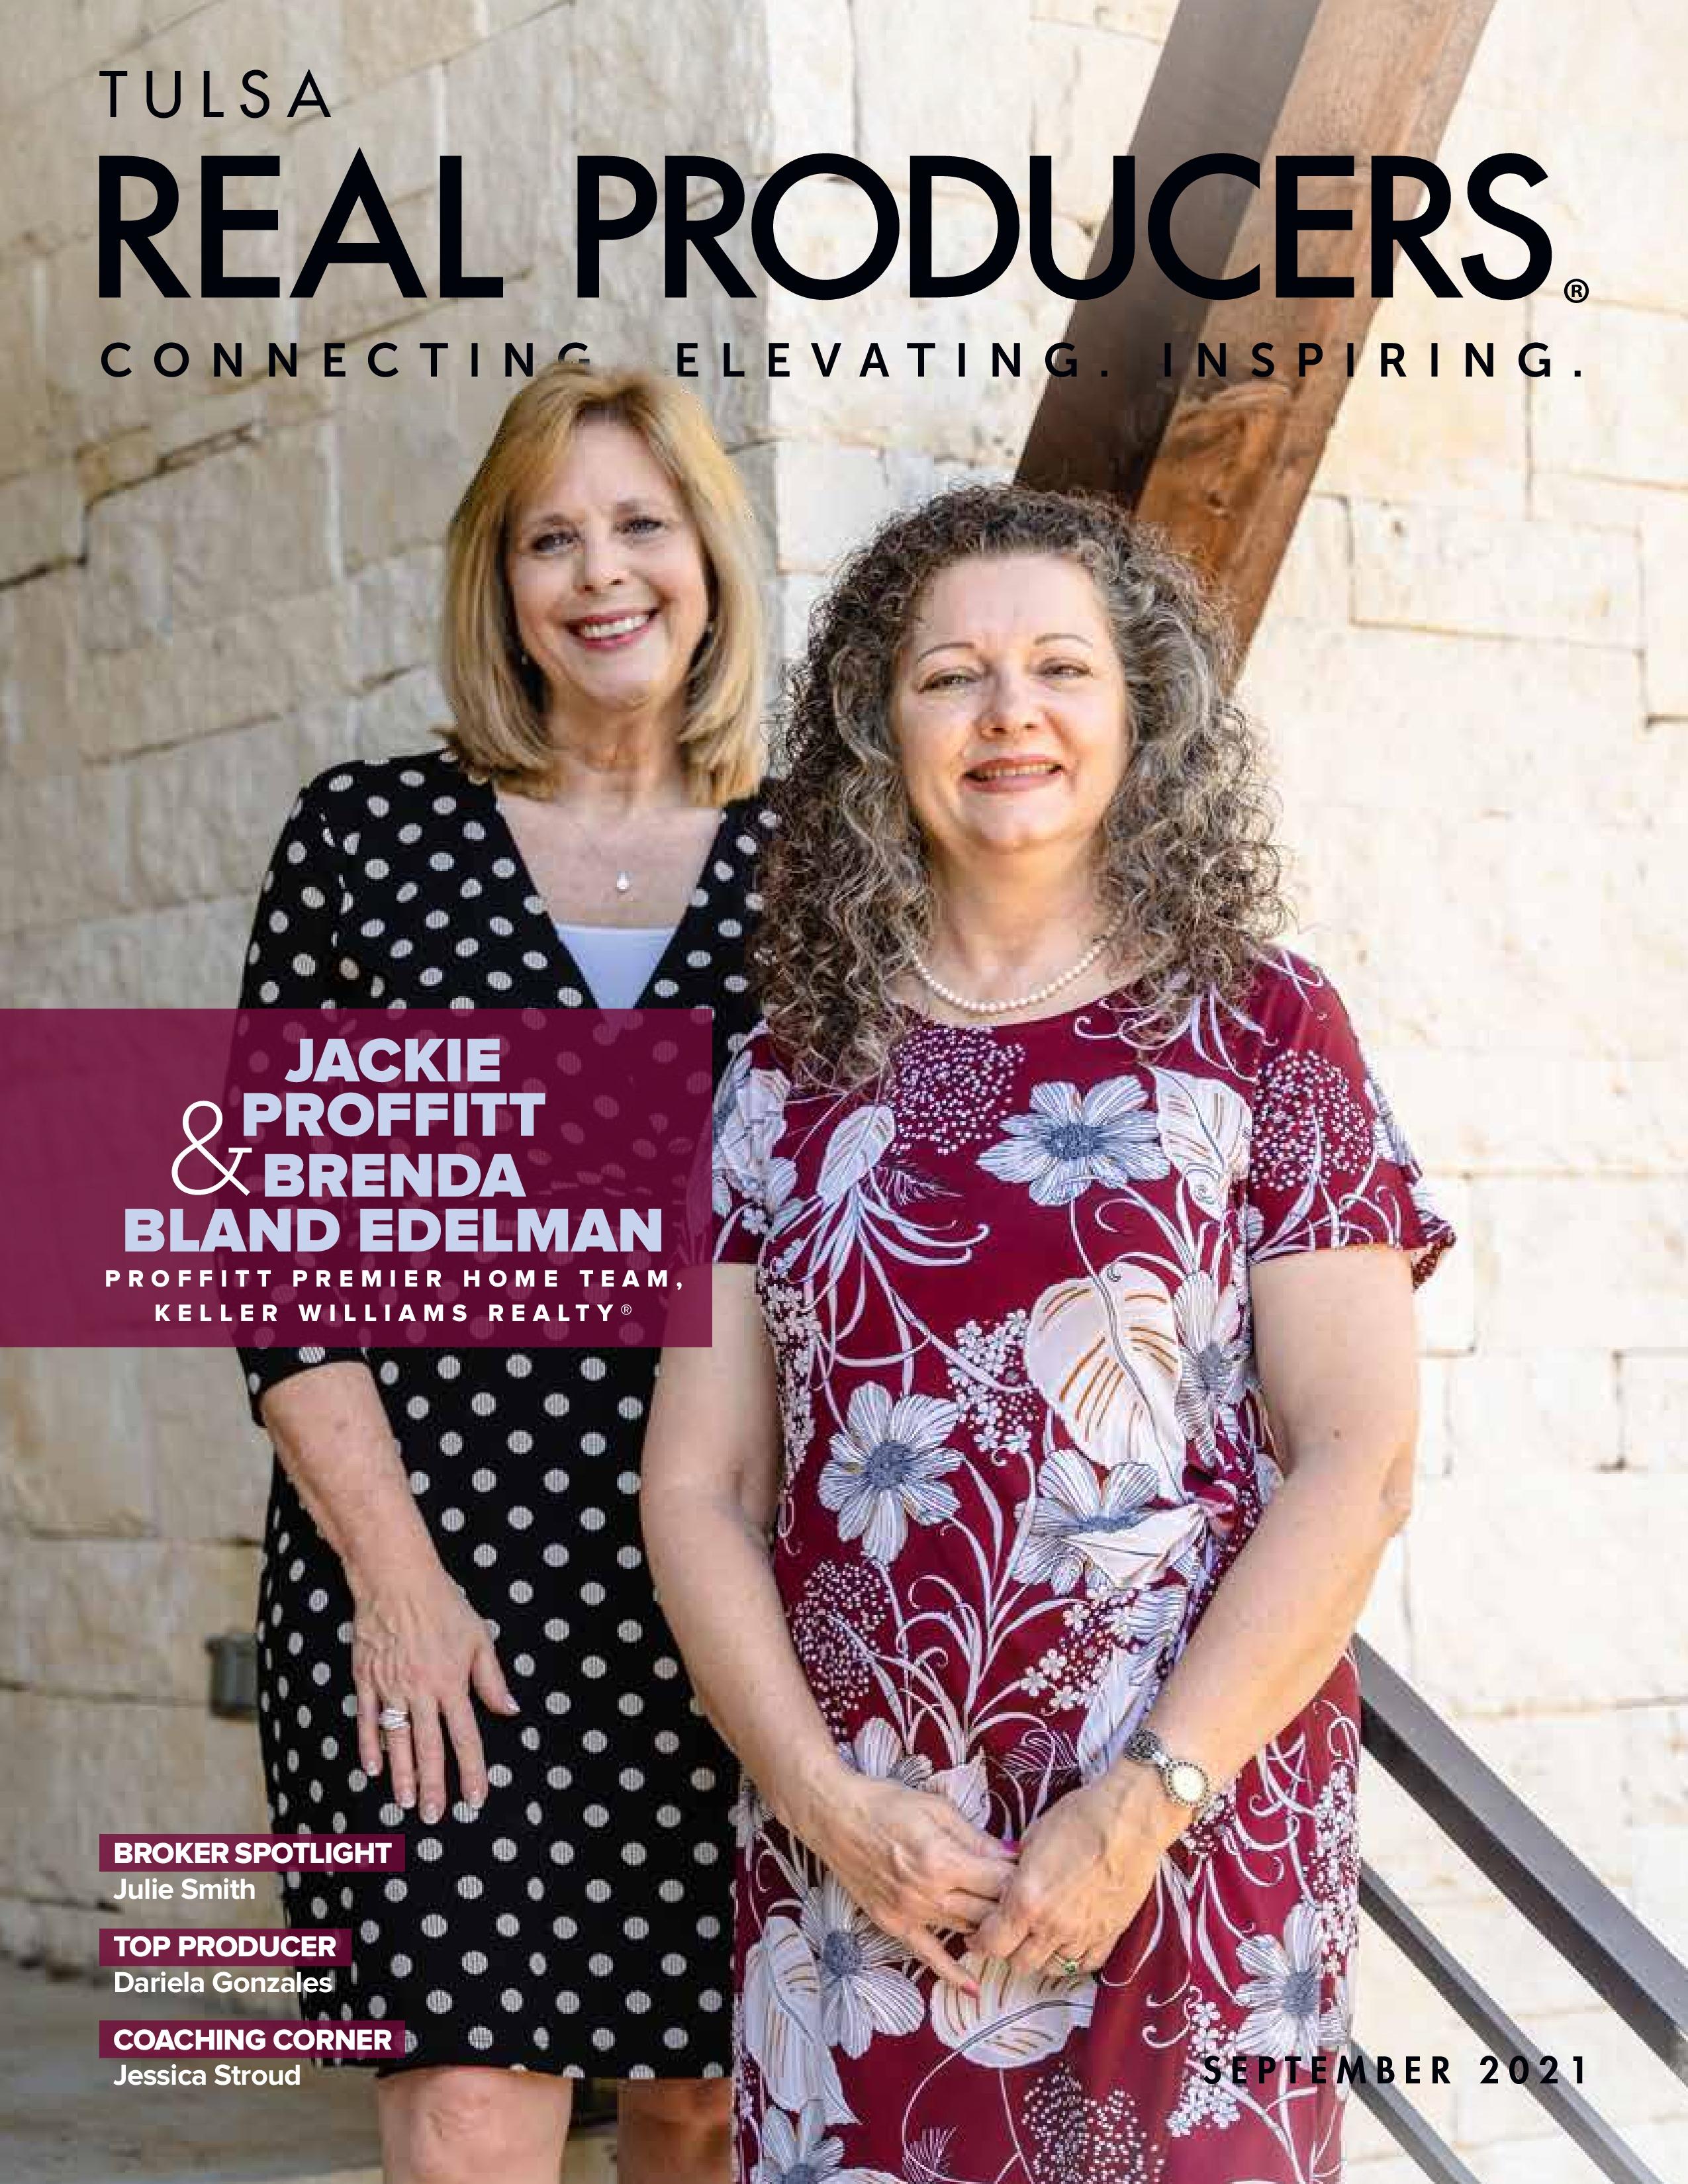 Tulsa Real Producers 2021-09-01